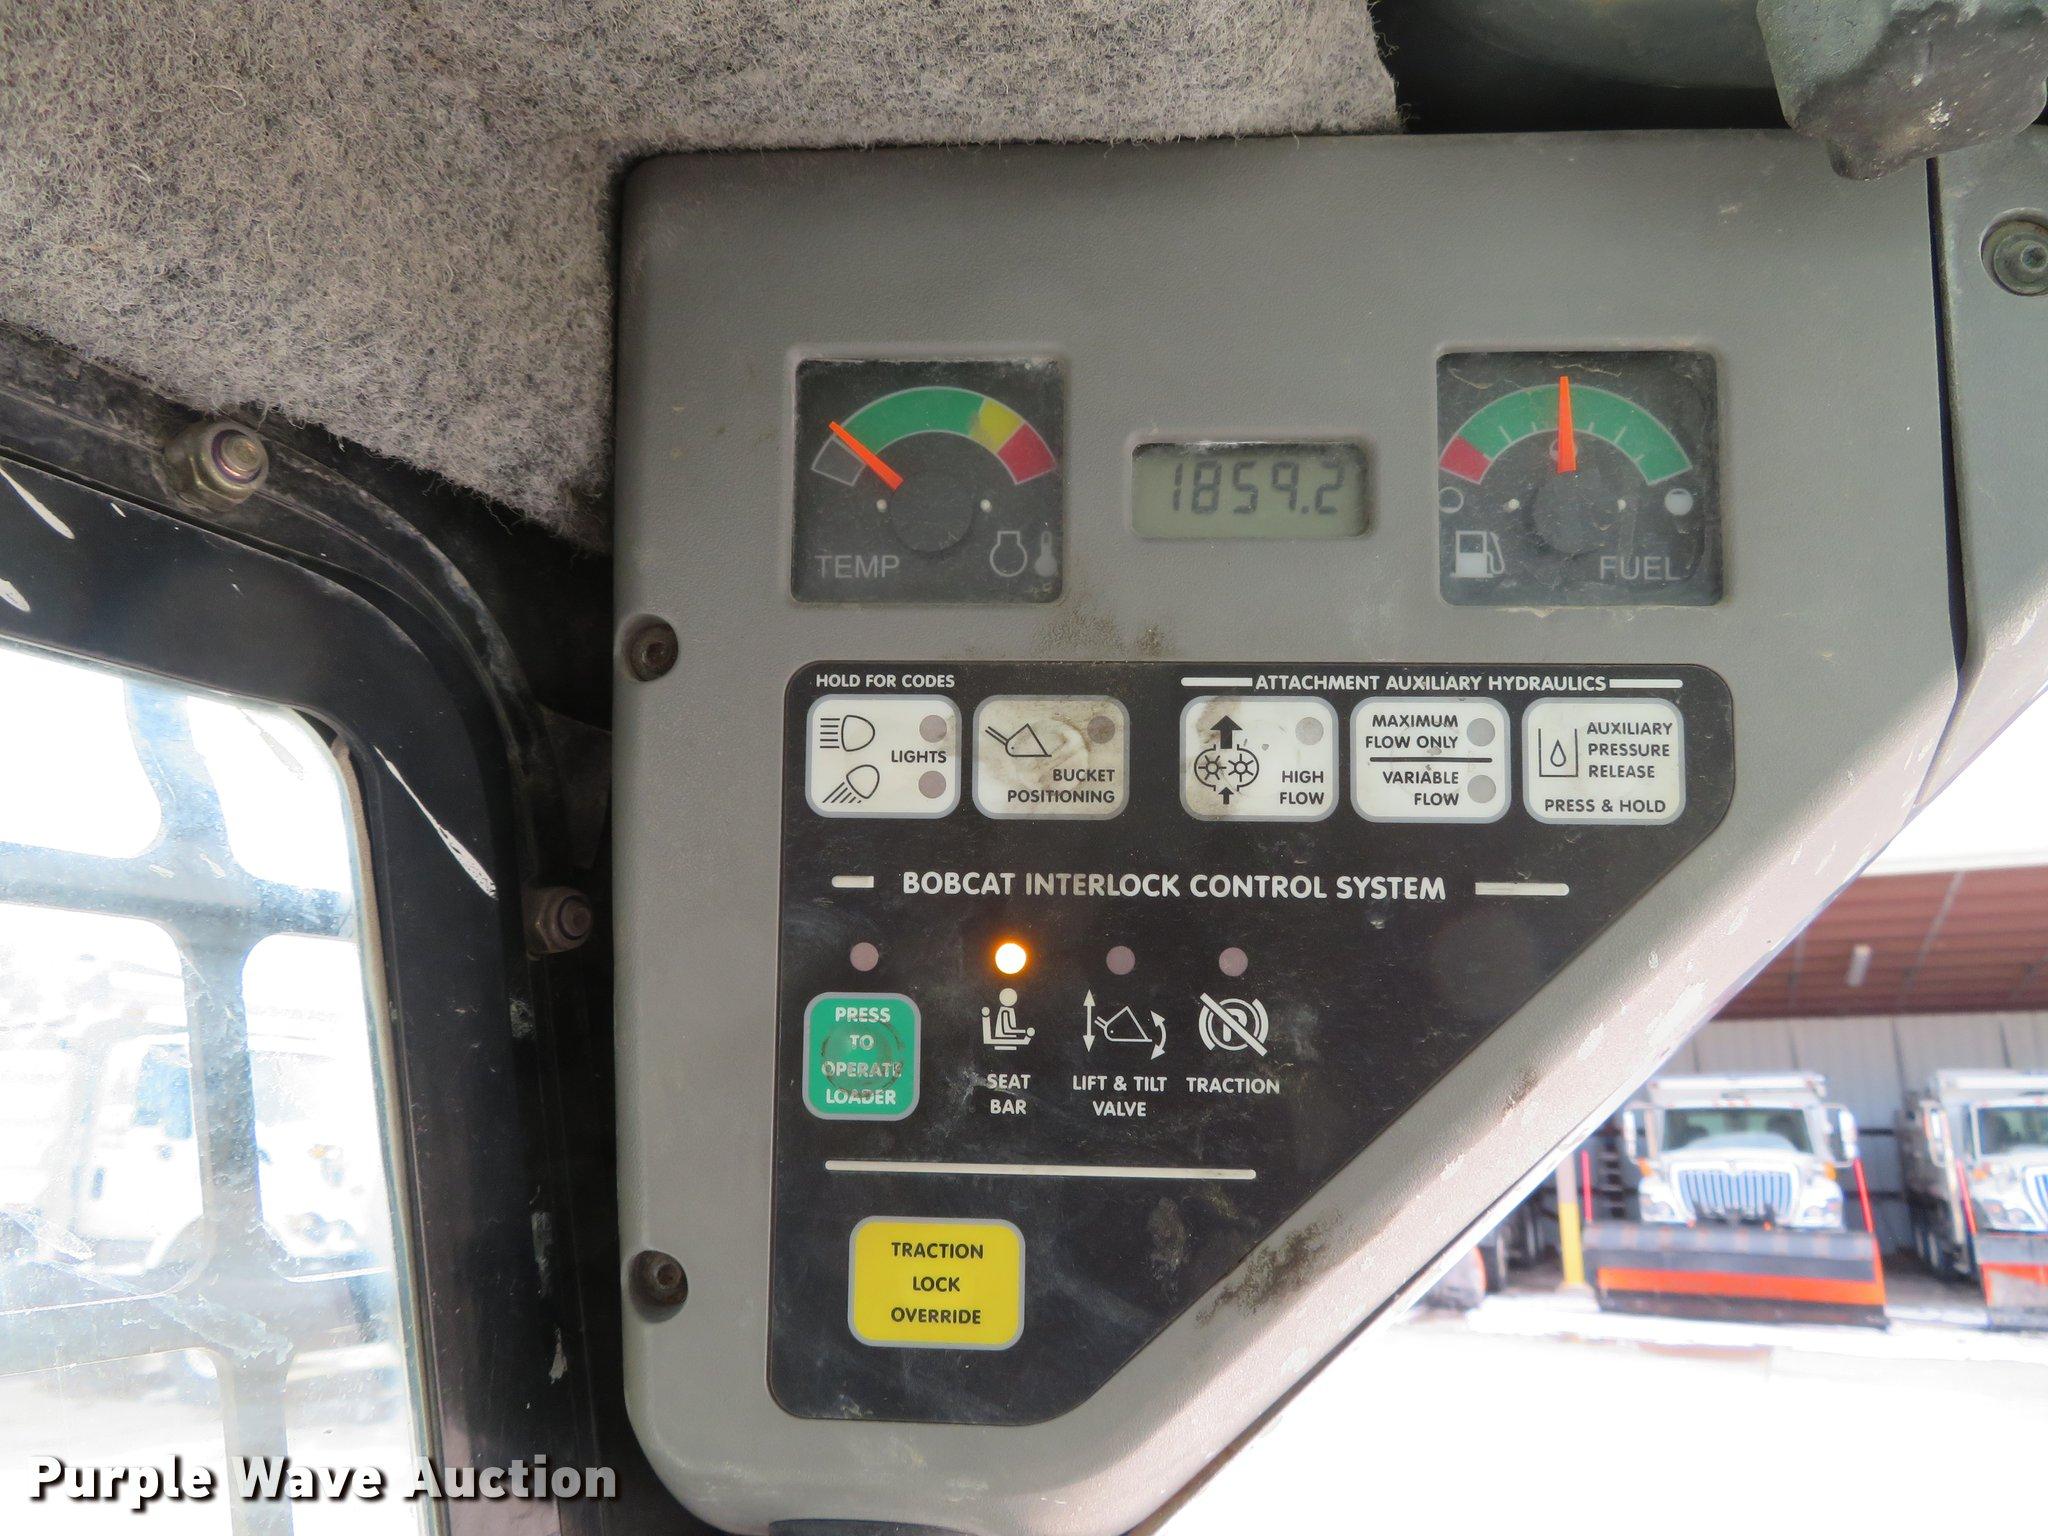 2006 Bobcat S250 skid steer | Item DG3896 | Tuesday April 16